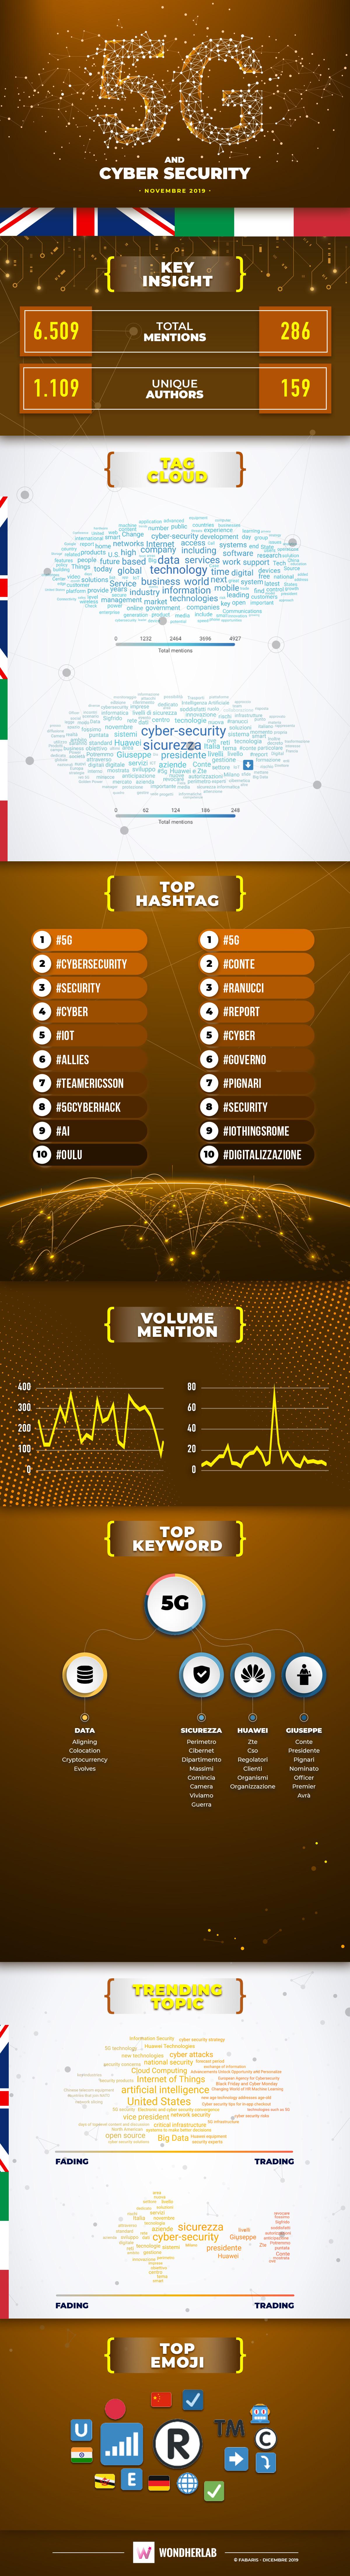 Infografica-novembre-5G-e-cyber-security